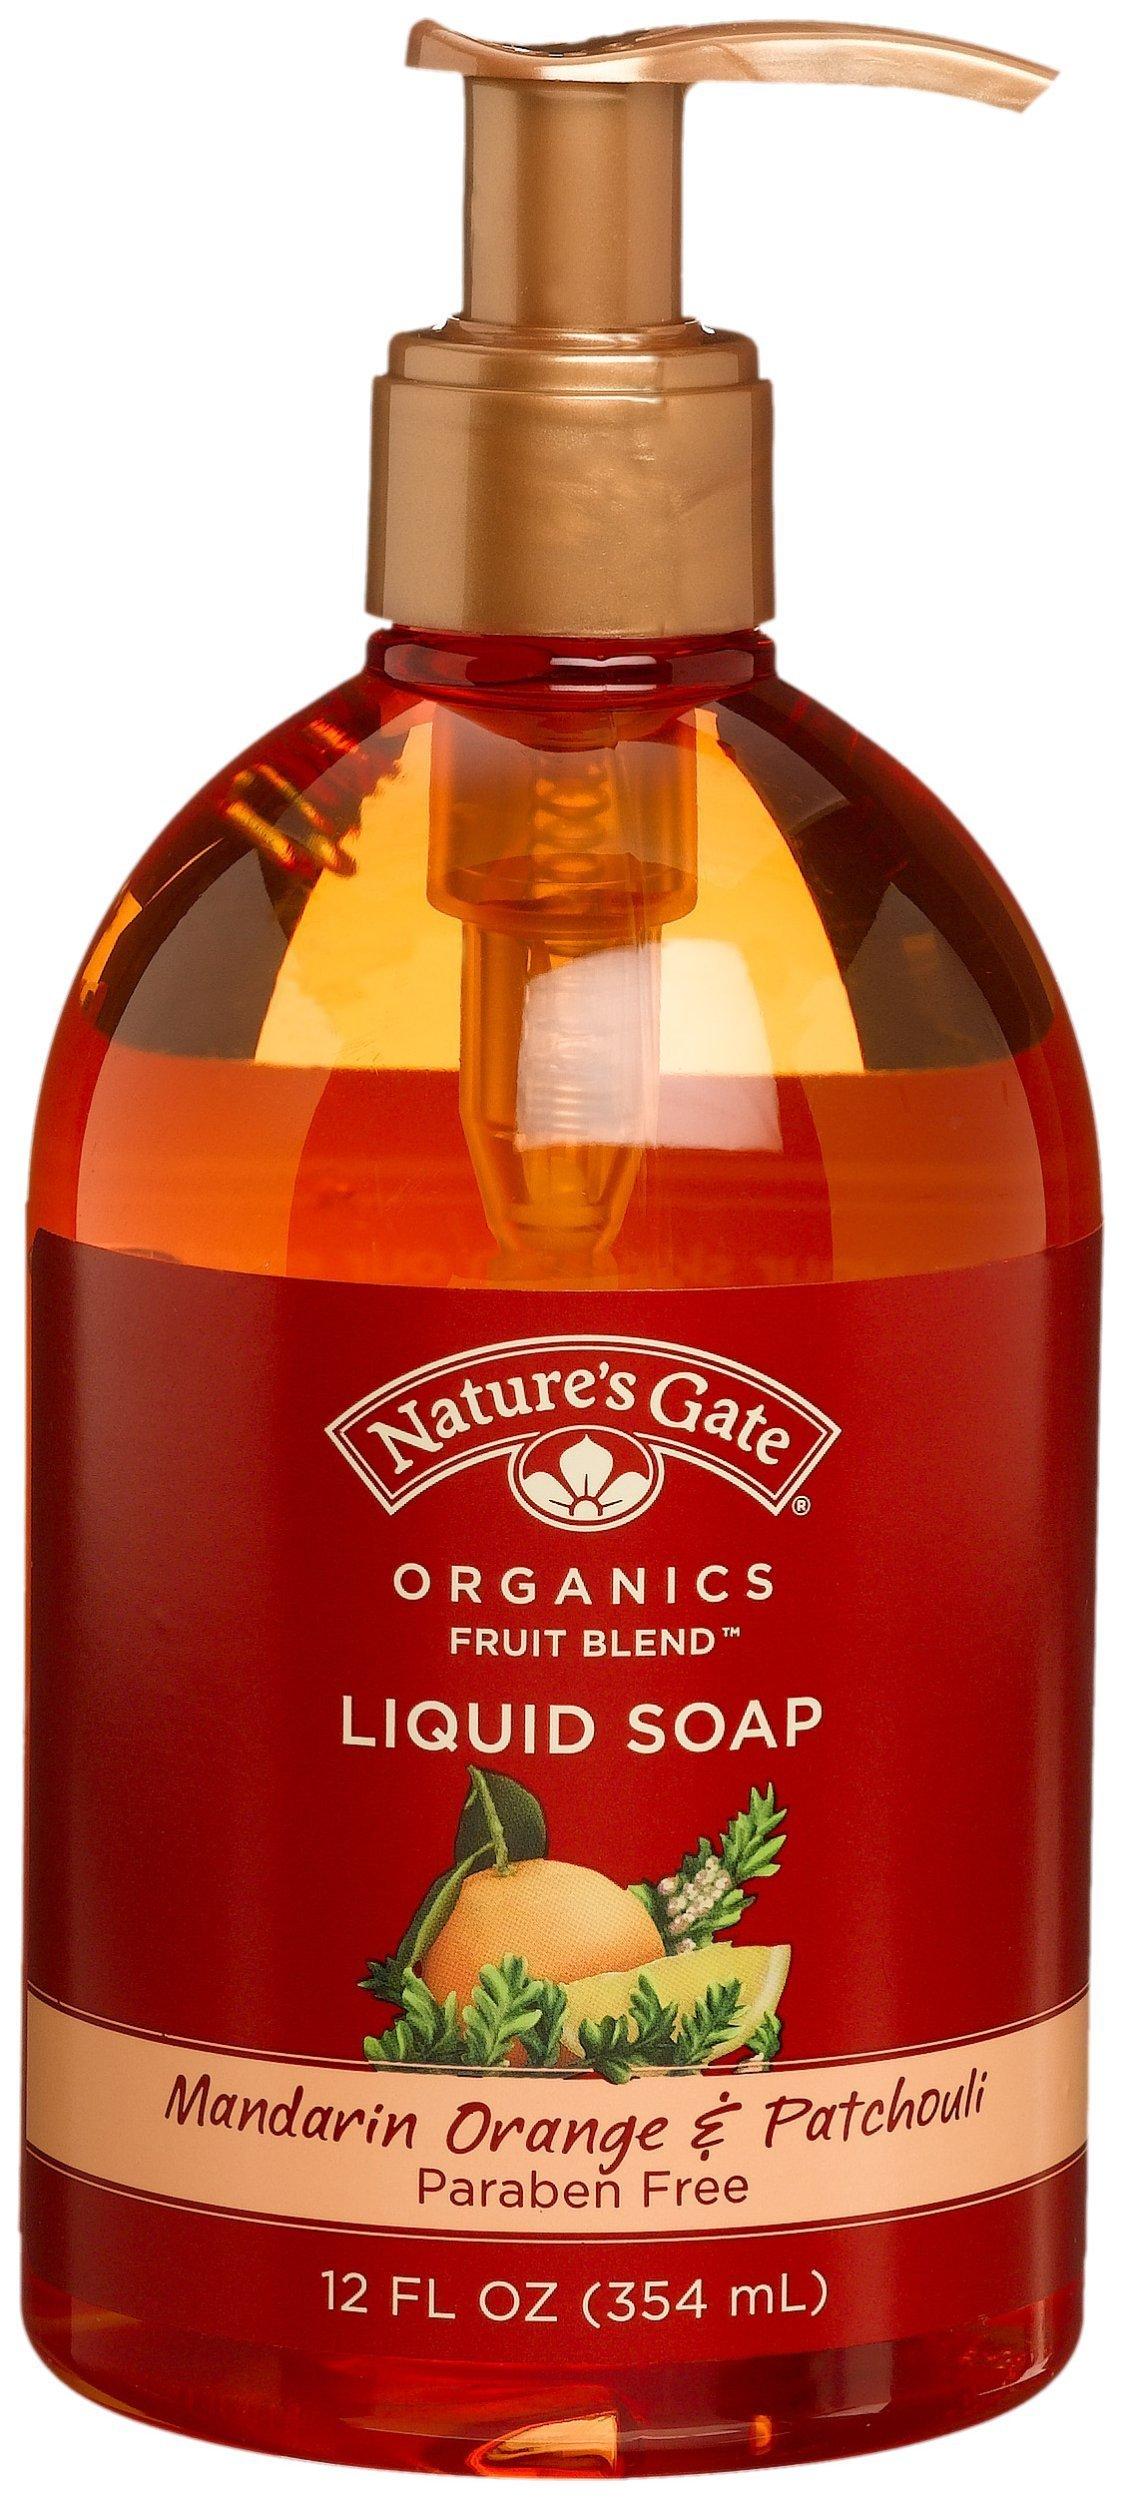 Nature's Gate Organics Fruit Blend Liquid Hand Soap, Mandarin Orange & Patchouli, 12 Ounce (Pack of 3)